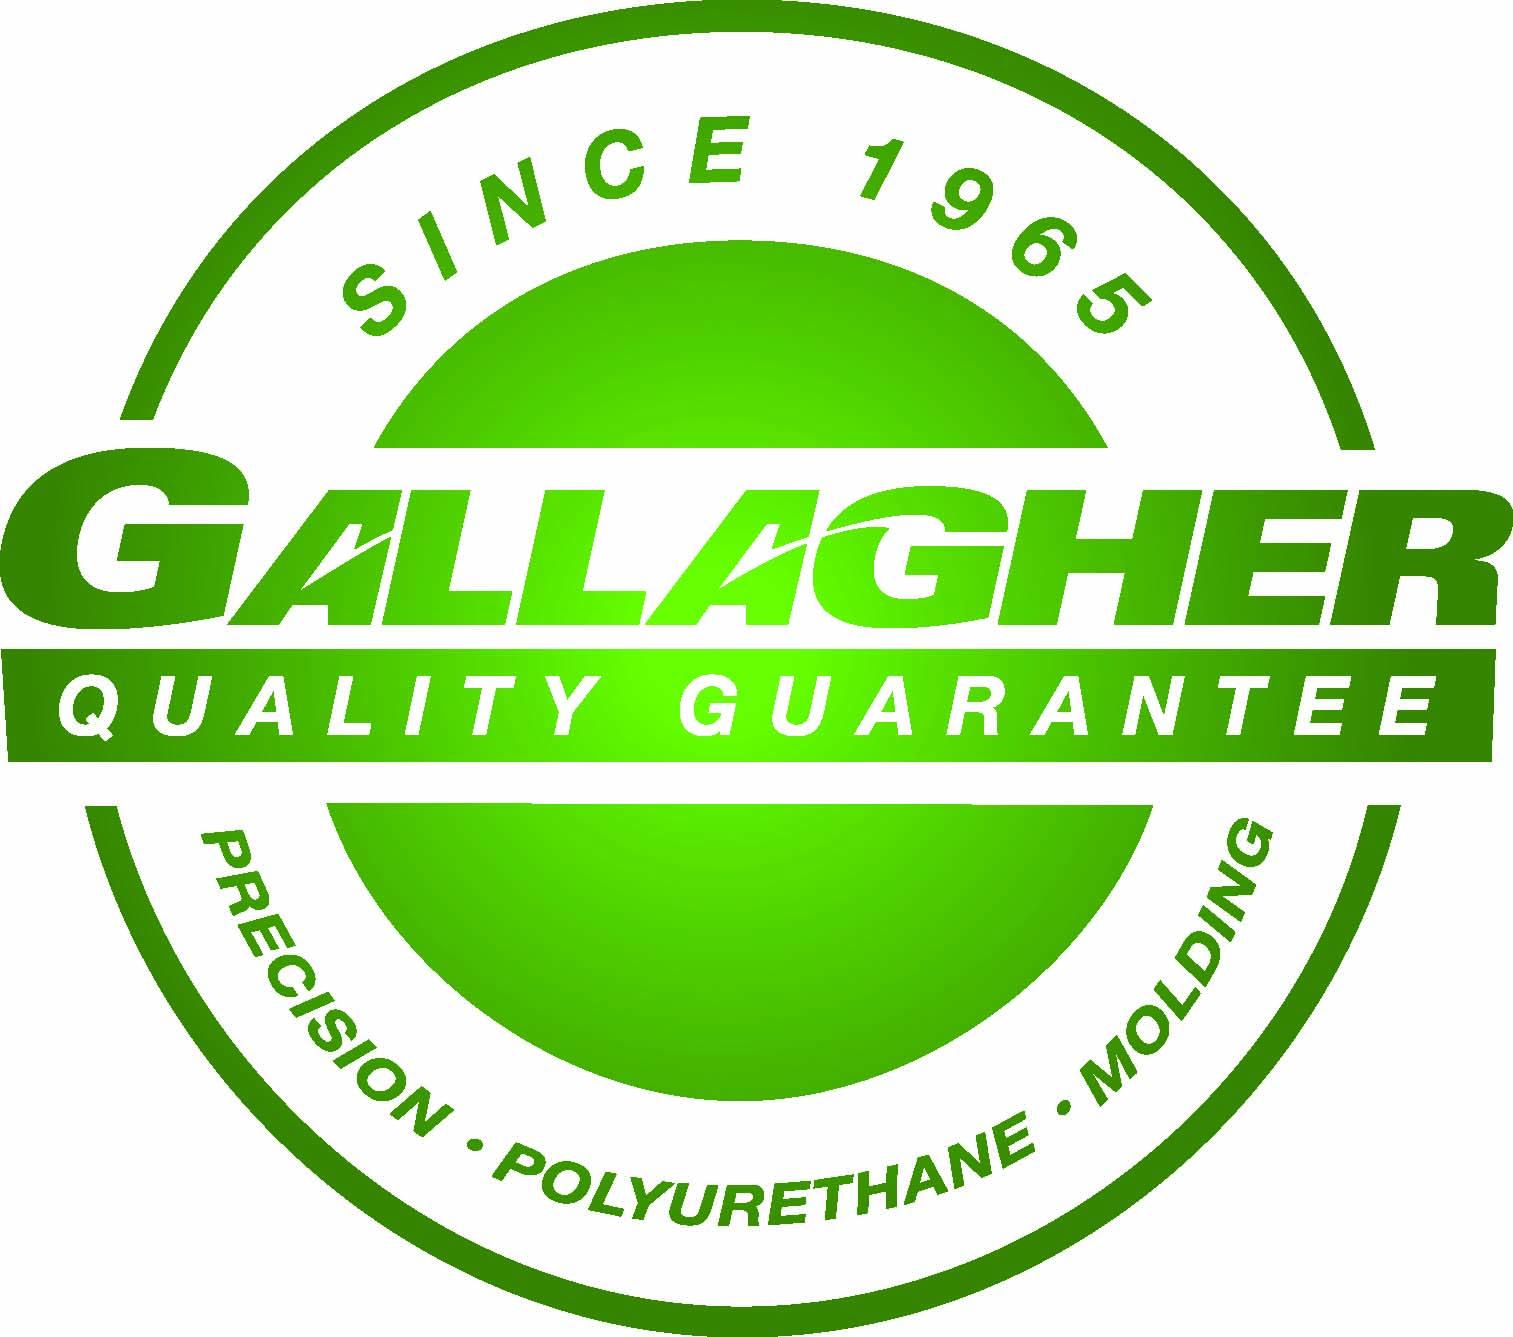 Gallagher Quality Guarantee Cast Polyurethane Manufacturer